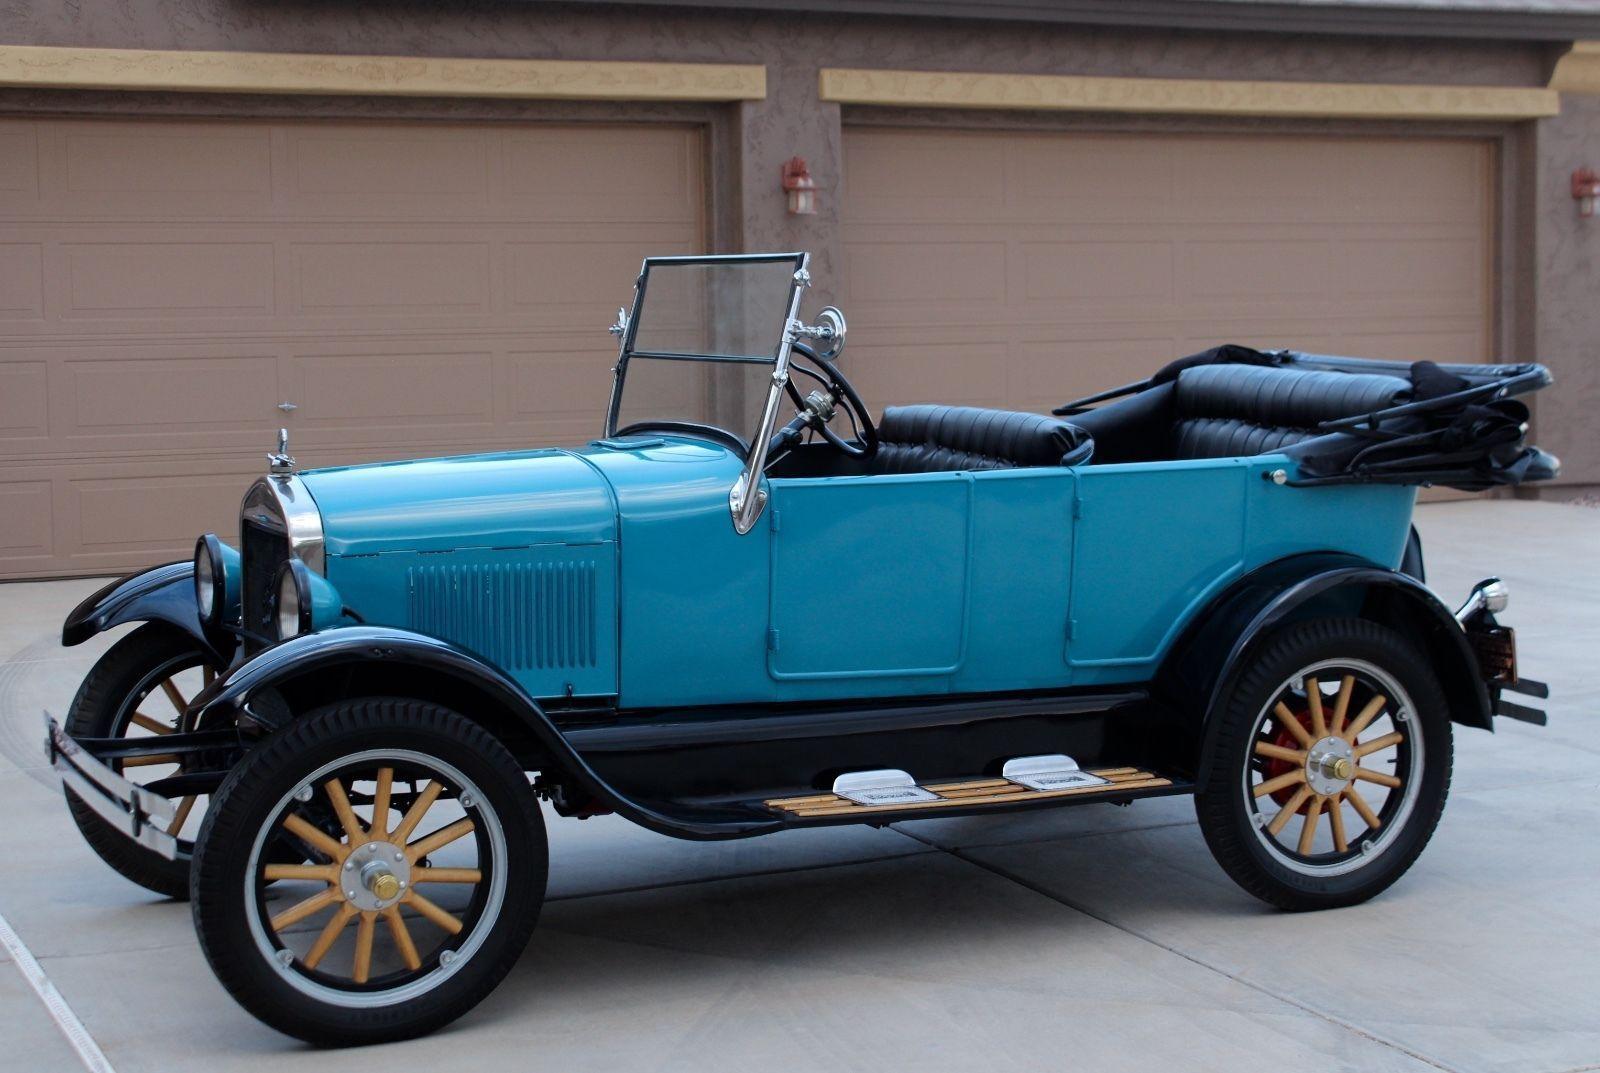 1927 Ford Model T 4 Door Touring Oldtimer in eBay Motors